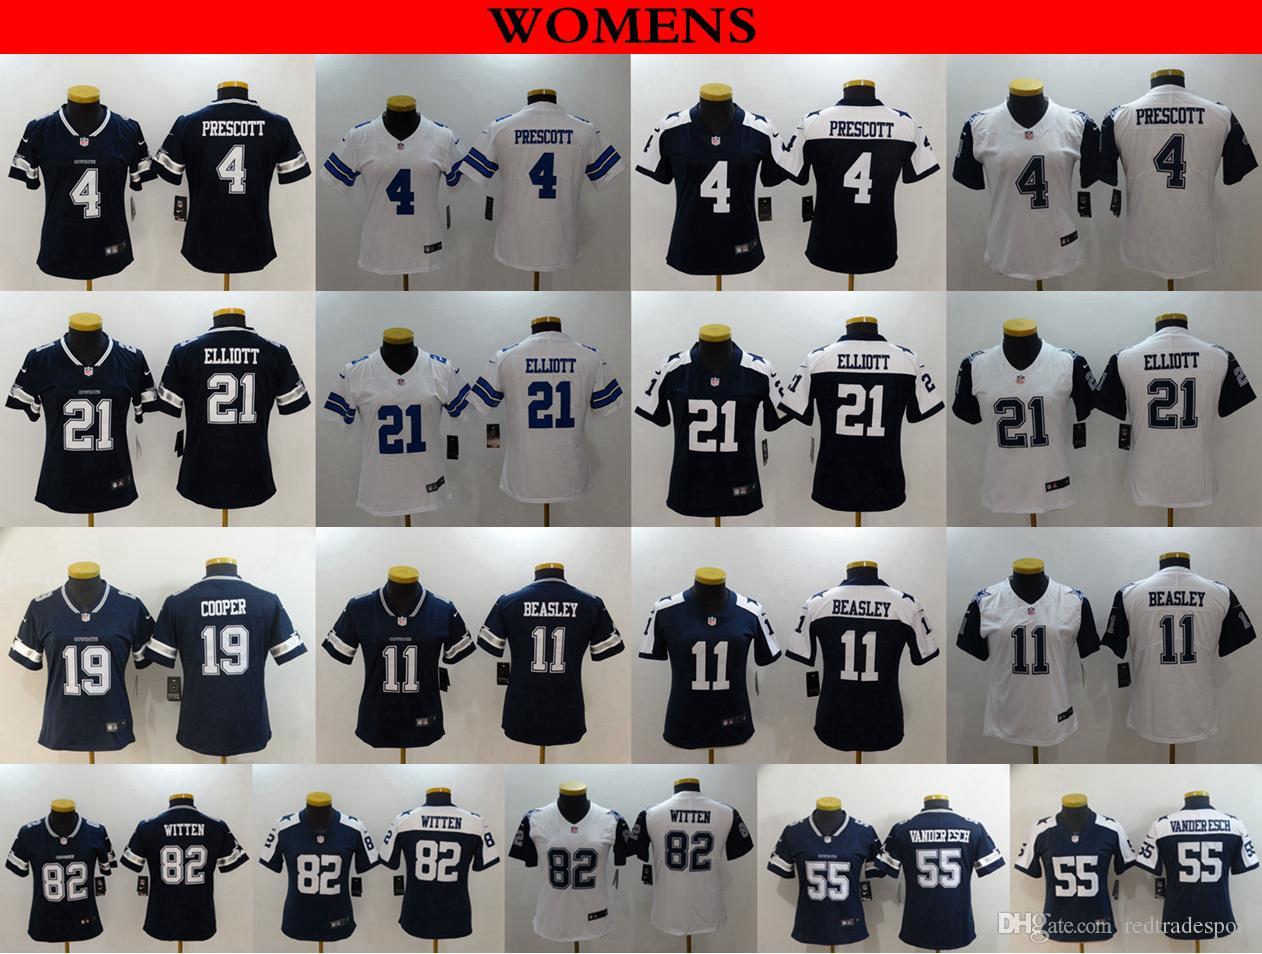 655b6c57f50 2019 Womens Dallas Ladies Cowboys 19 Amari Cooper 11 Cole Beasley 4 Dak  Prescott Witten Ezekiel Elliott 55 Leighton Vander Esch Football Jerseys  From ...